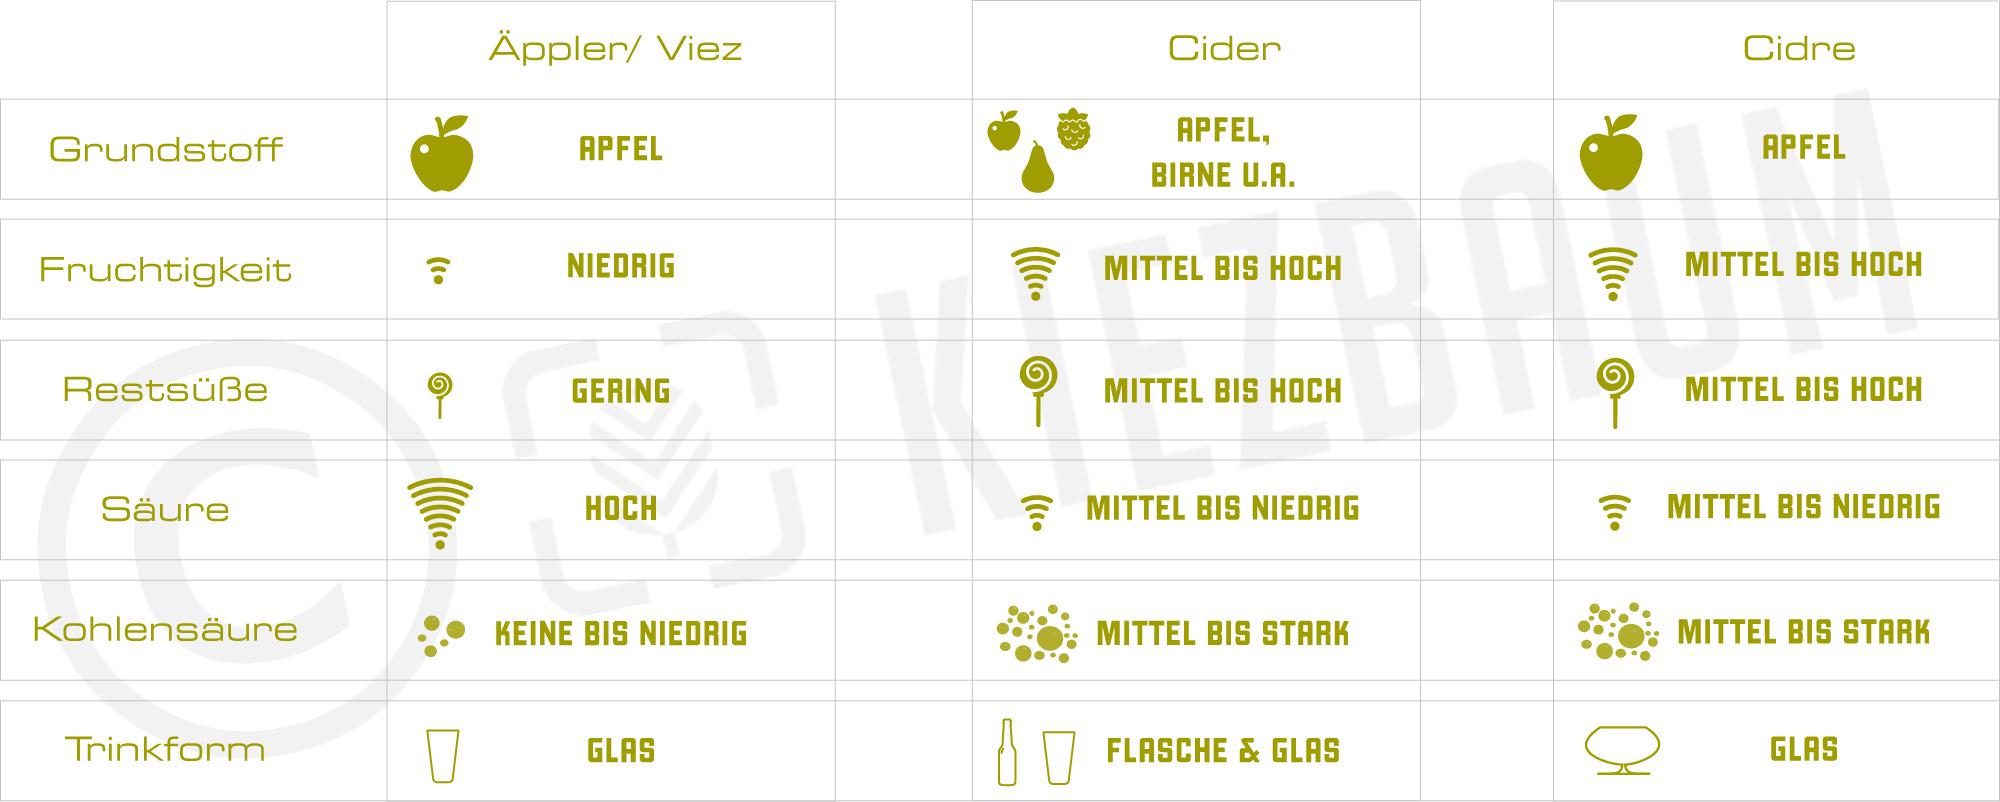 Kiezbaum_Cider_Kategorisierung